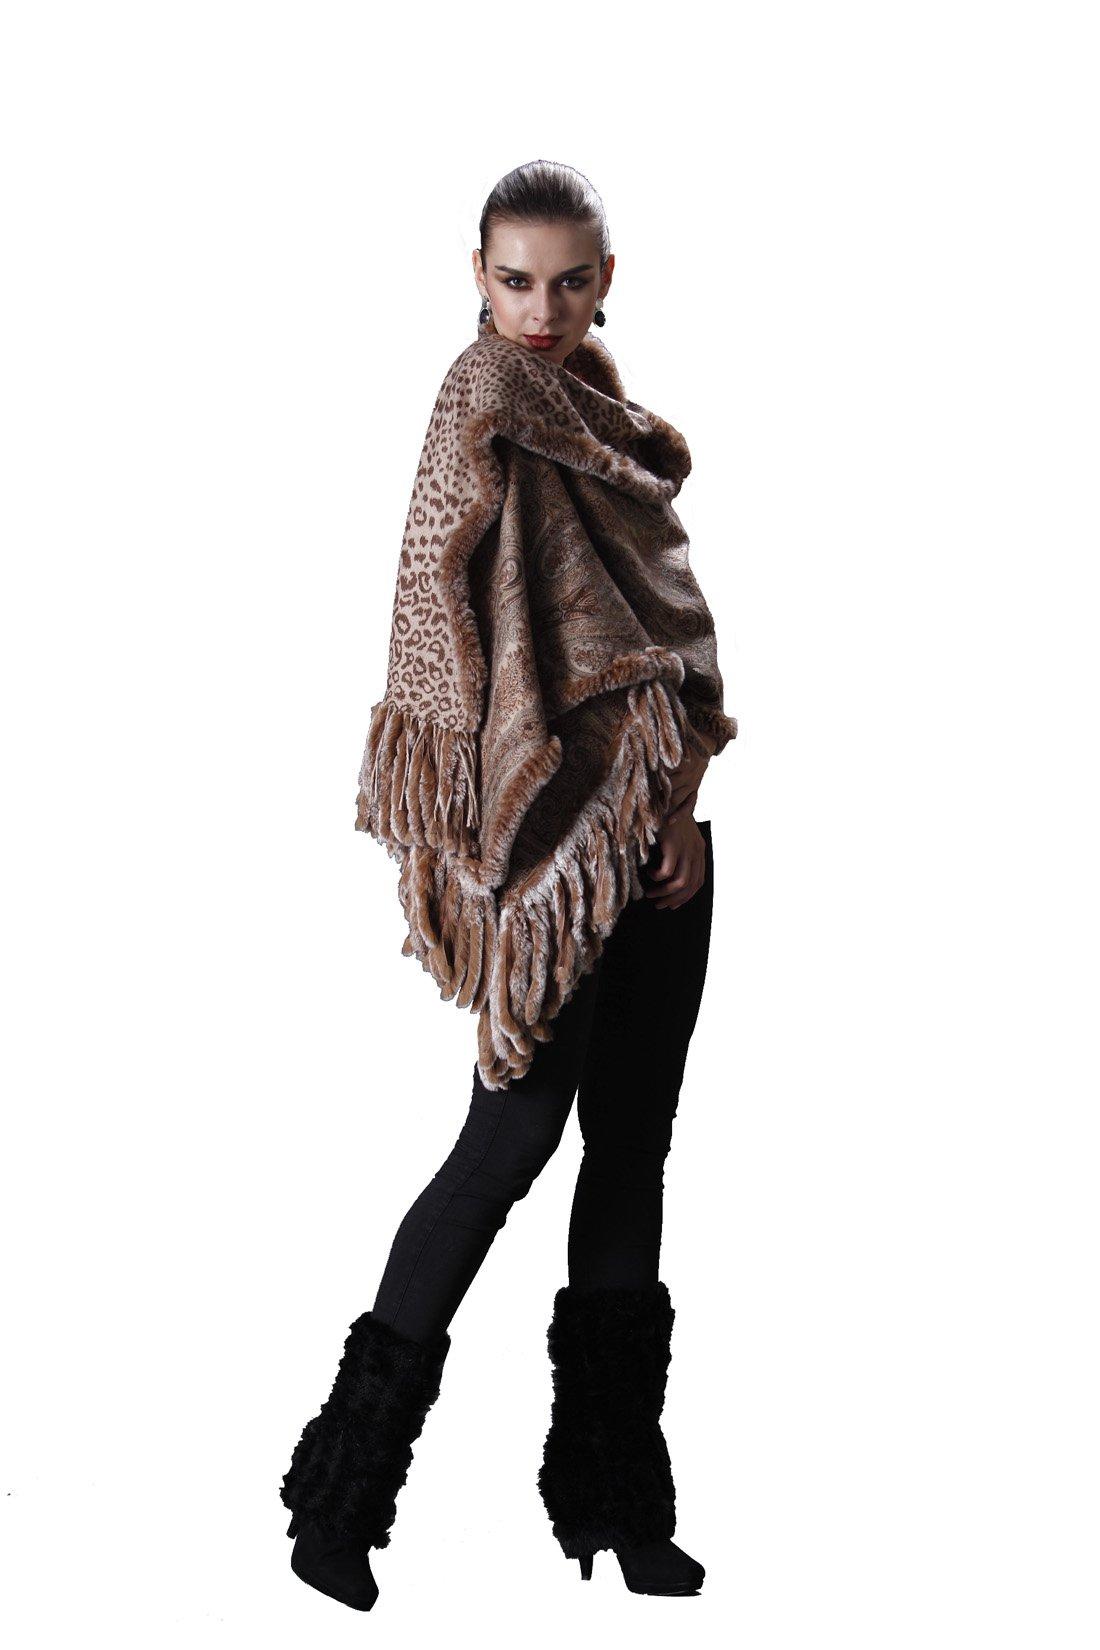 Cashmere Pashmina Group-Cashmere Shawl Scarf Wrap Stole (Solid/ Reversible Print w/ Genuine Fur) - Camel